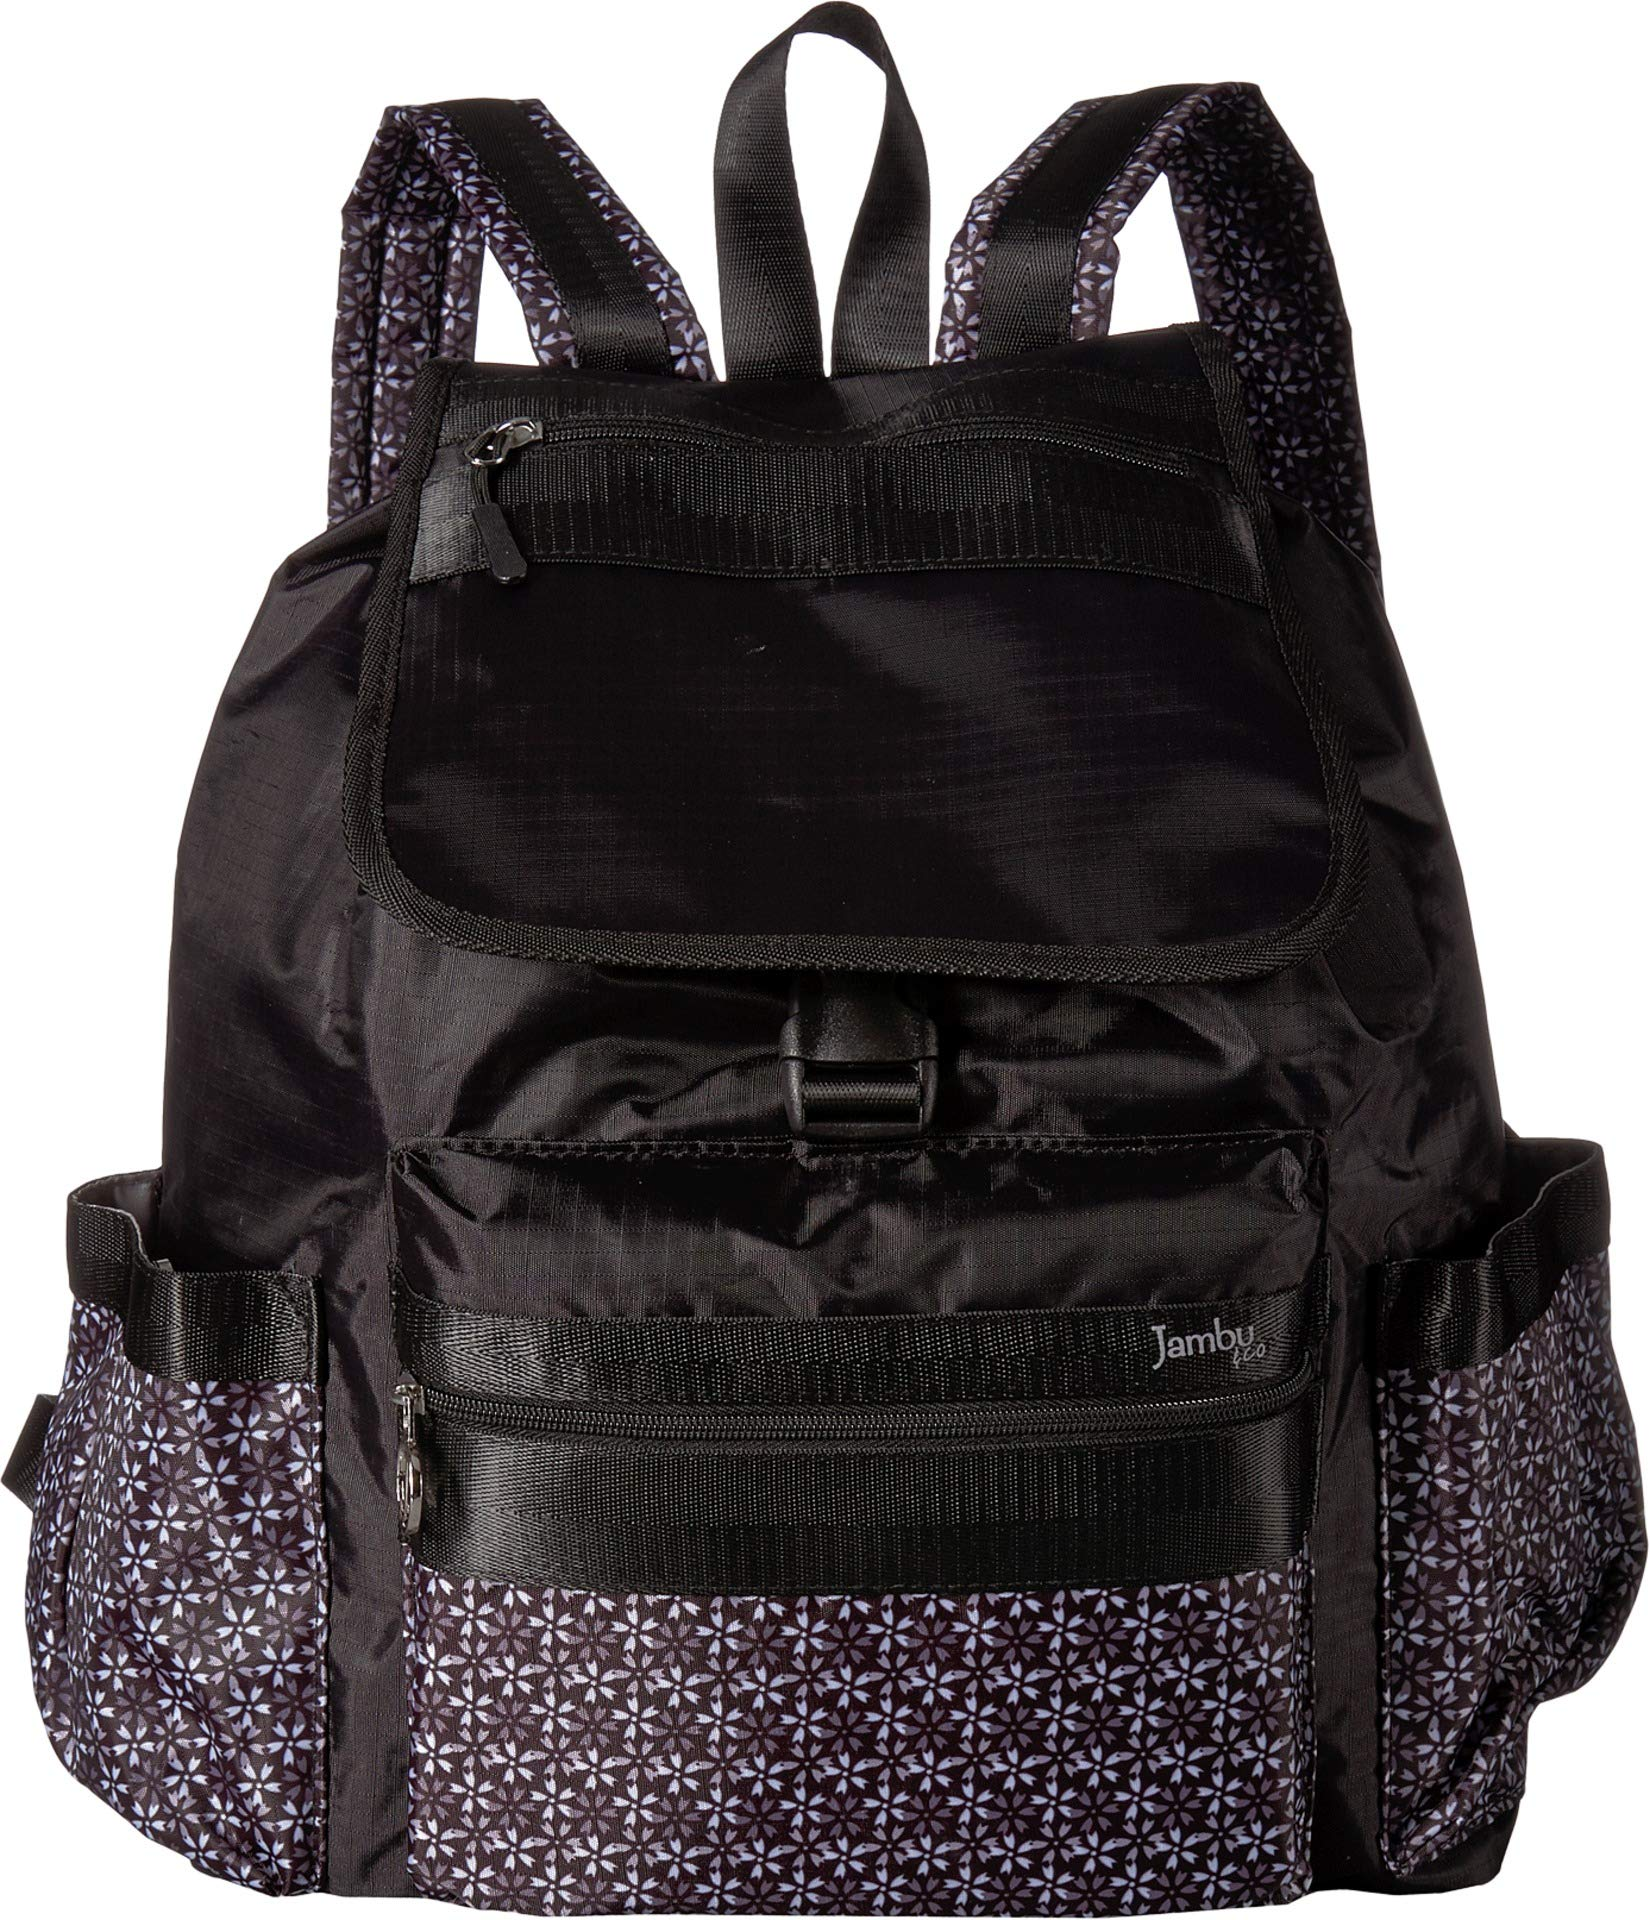 Jambu Women's Drawstring Backpack Black One Size